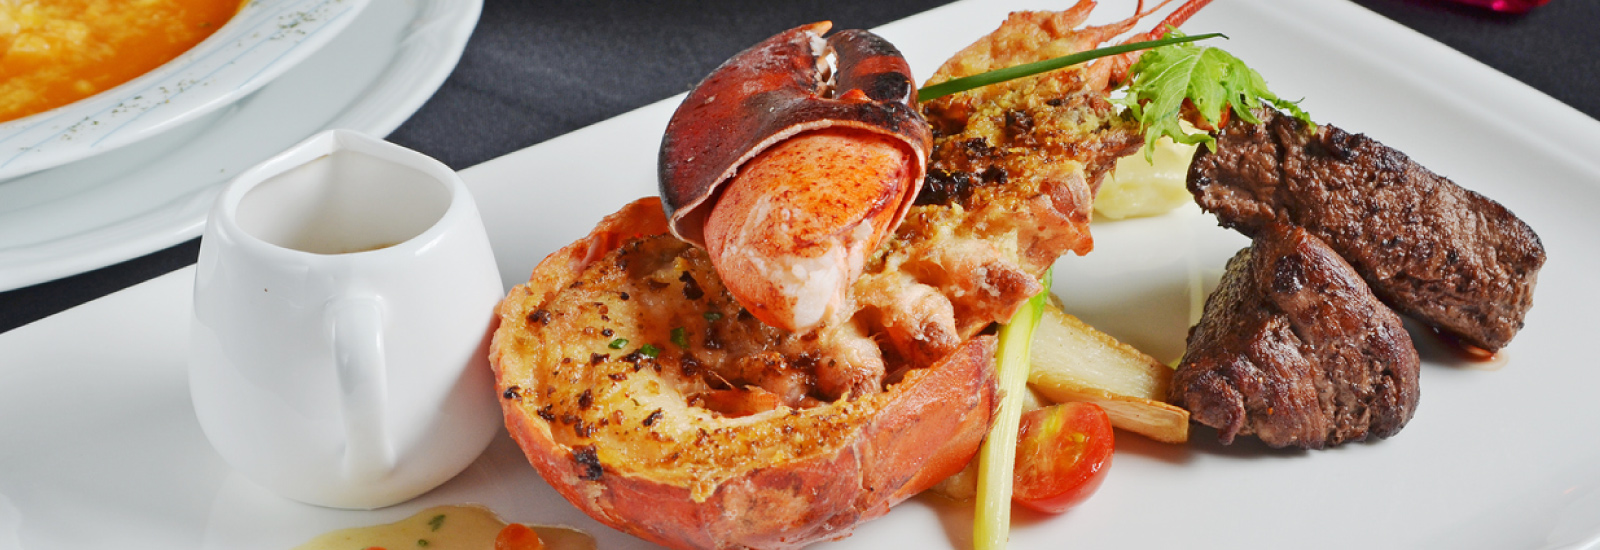 Steak And Seafood Restaurants in Virginia Beach